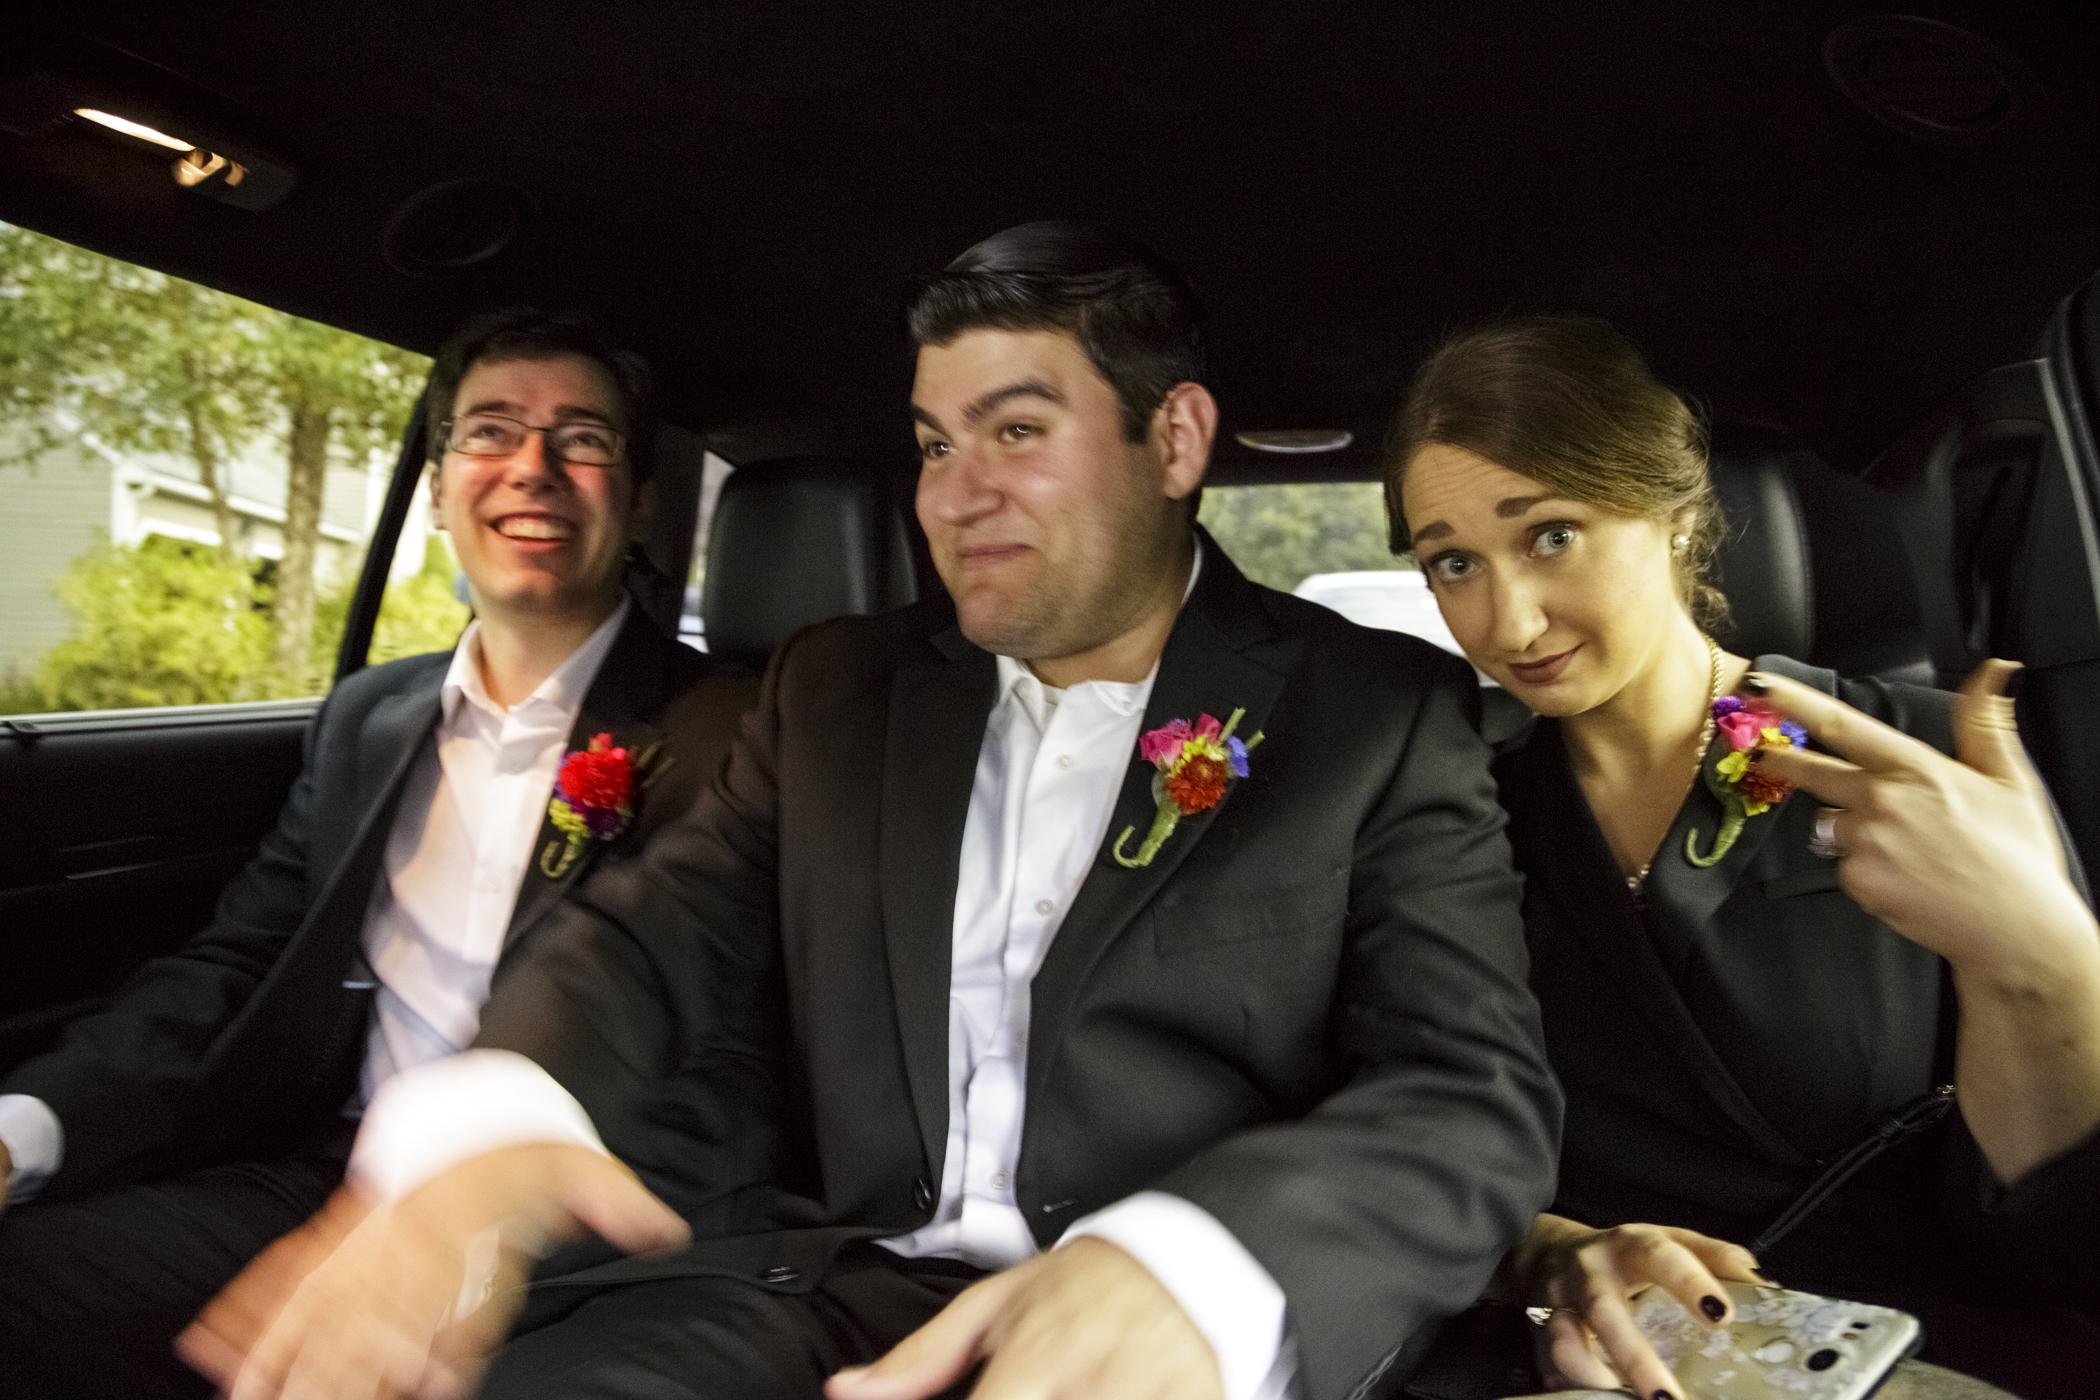 Jonorato Wedding Day-16.jpg